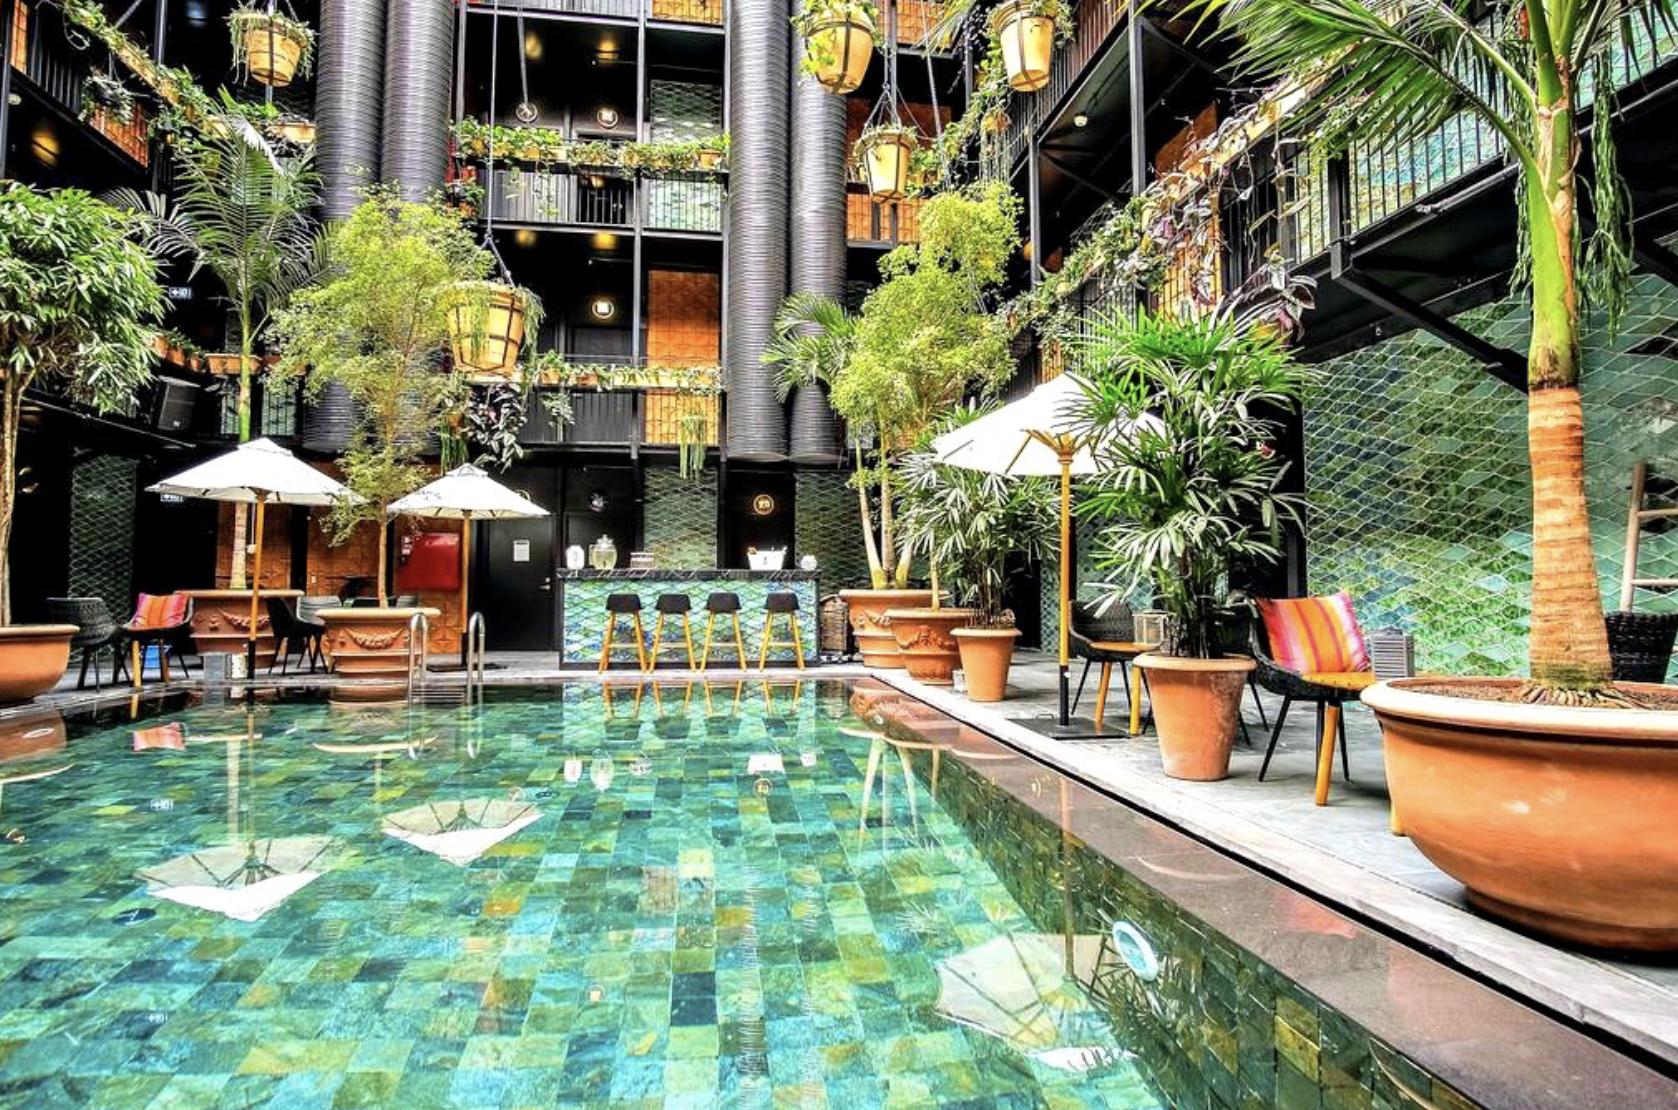 SLEEP_  MANON LES SUITES.  #UrbanChic #Outdoor #Garden #CityPool #Hipster   https://guldsmedenhotels.com/manon-les-suites/